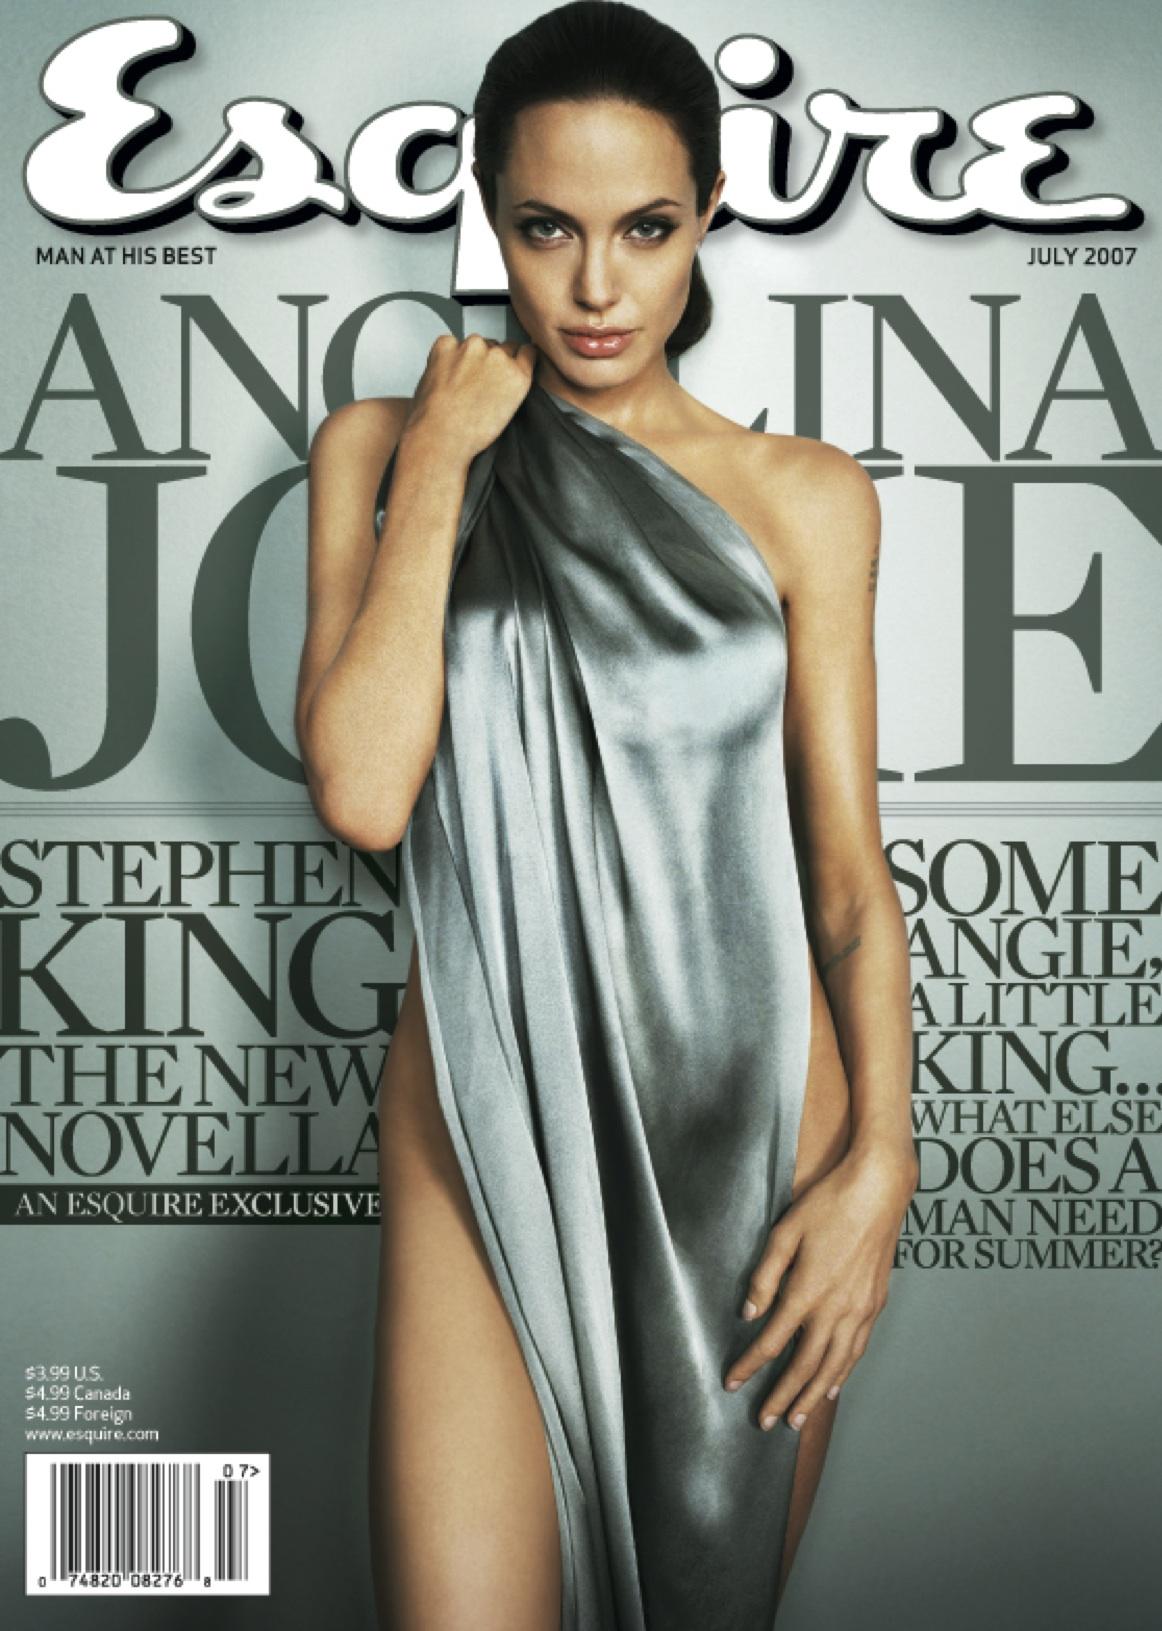 Jolie Magazine November 2017 Issue: Angelina Jolie's Greatest Career